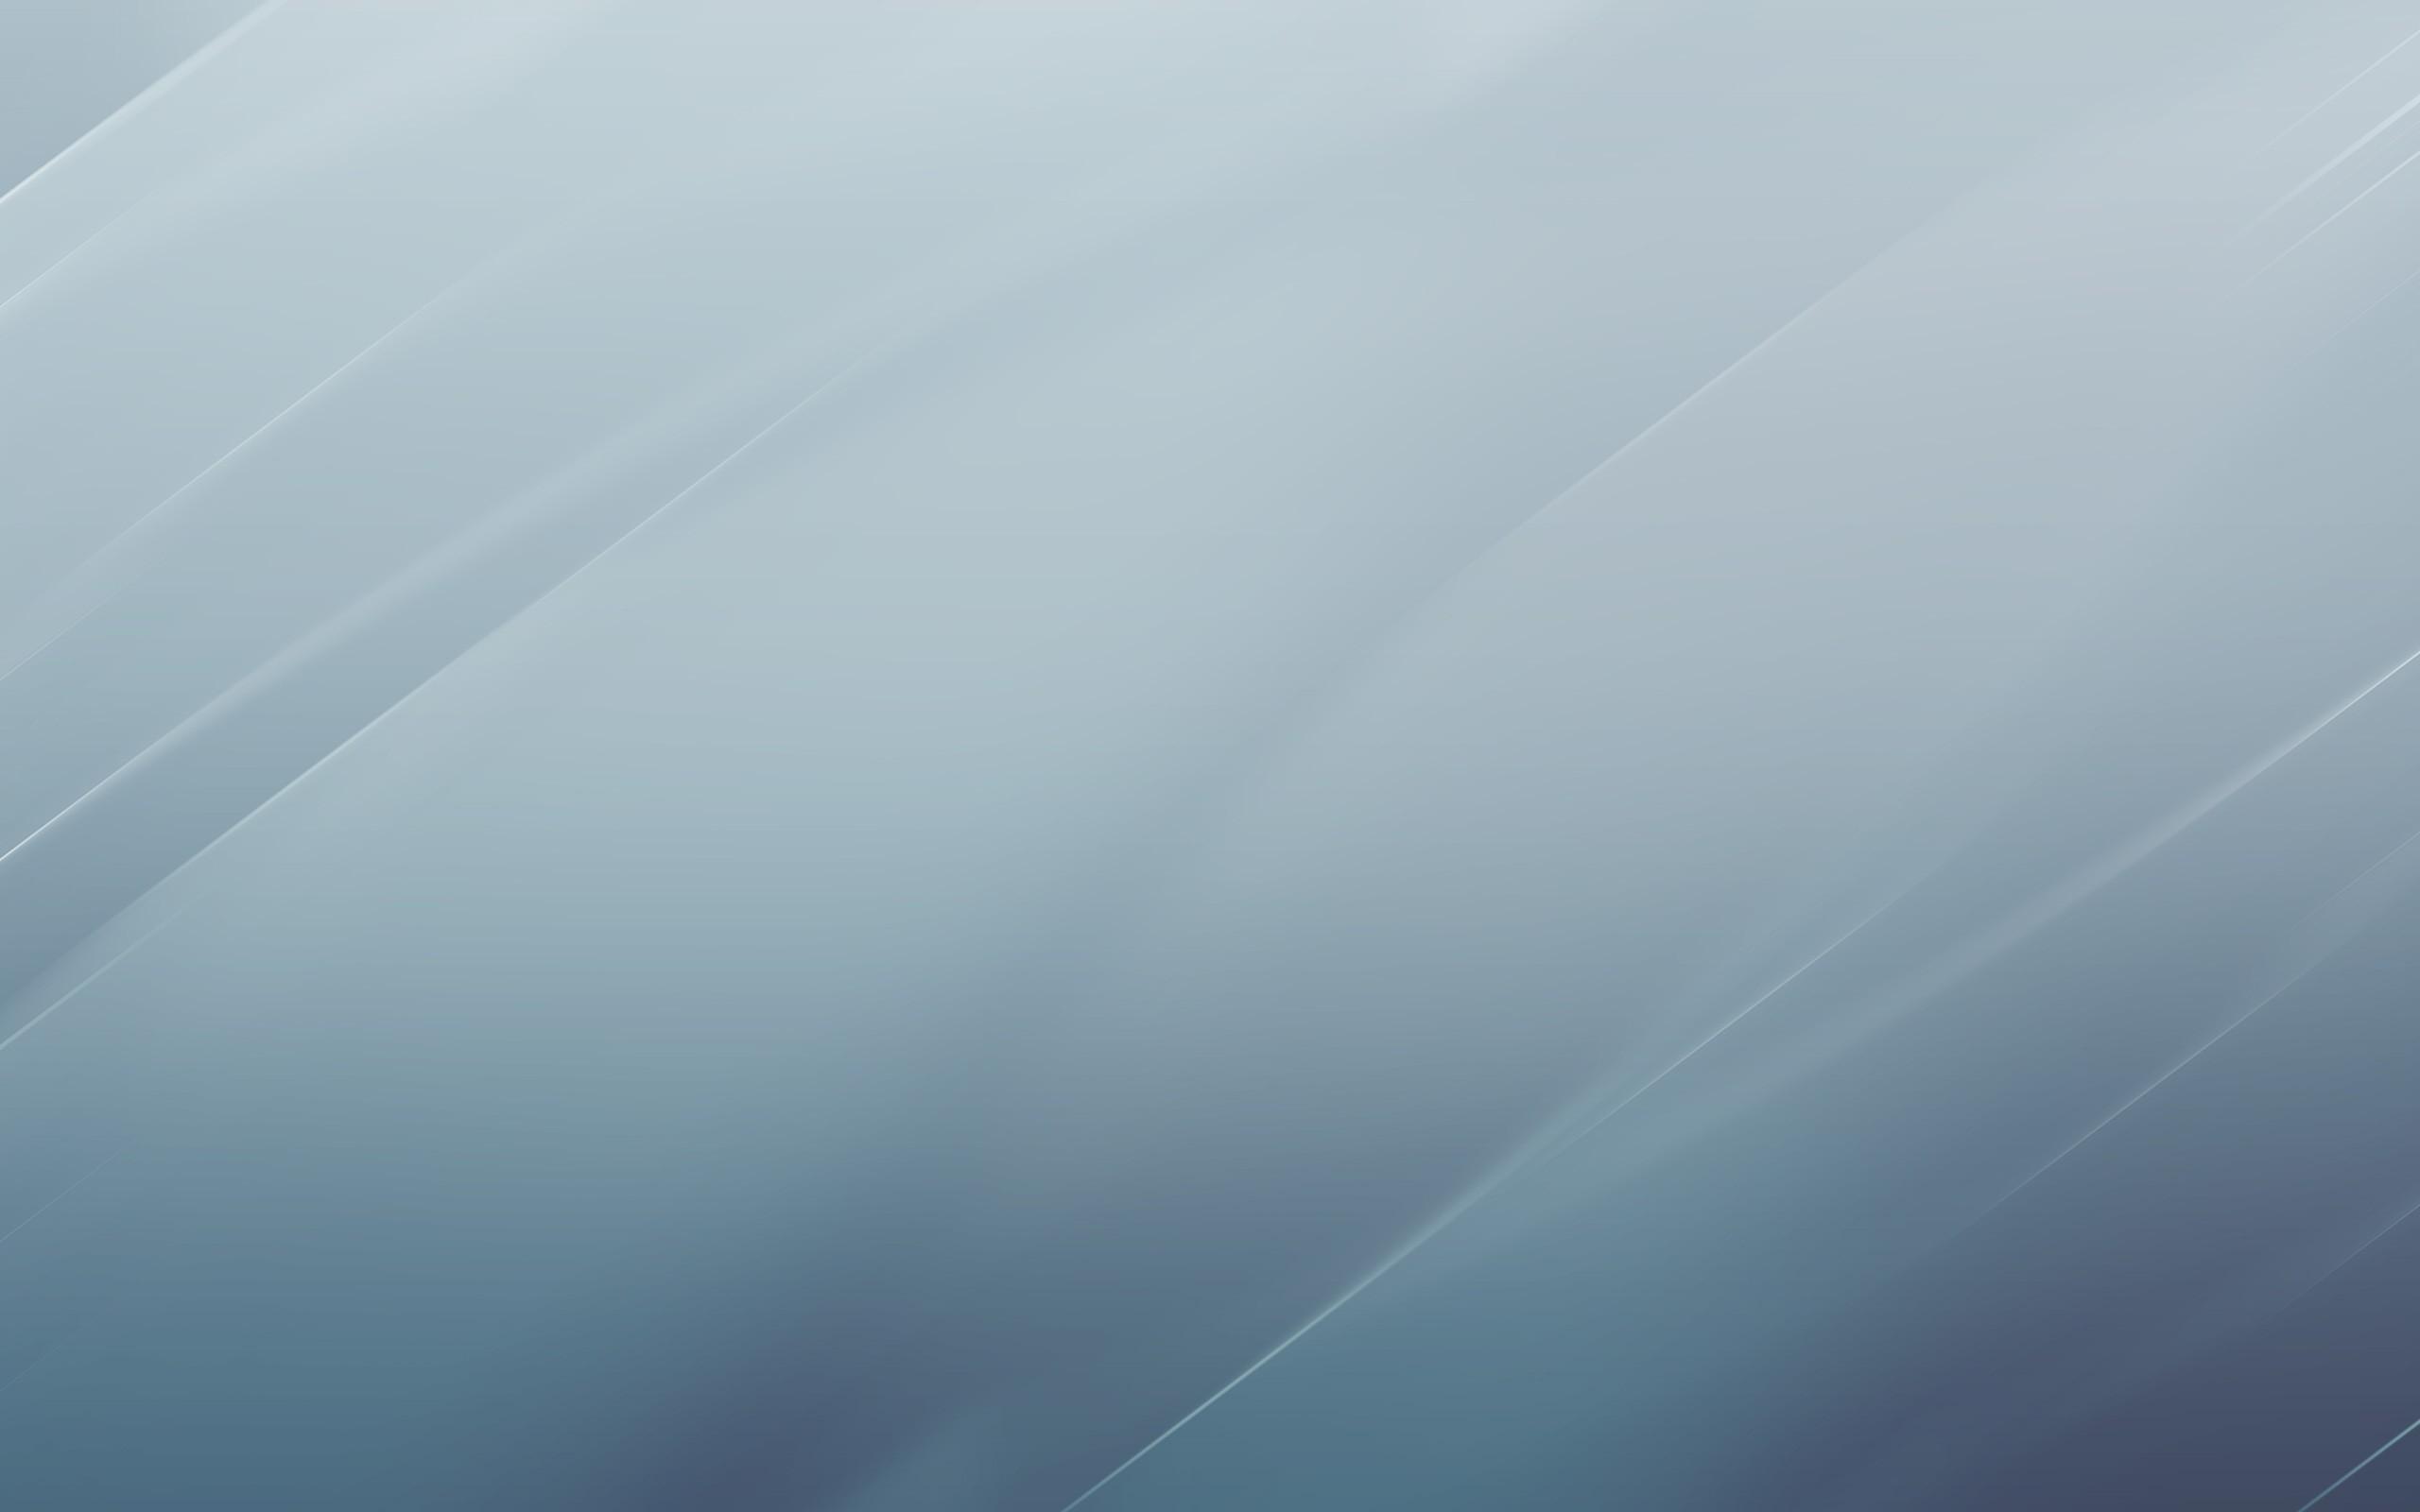 Wallpaper line, light, background, bright